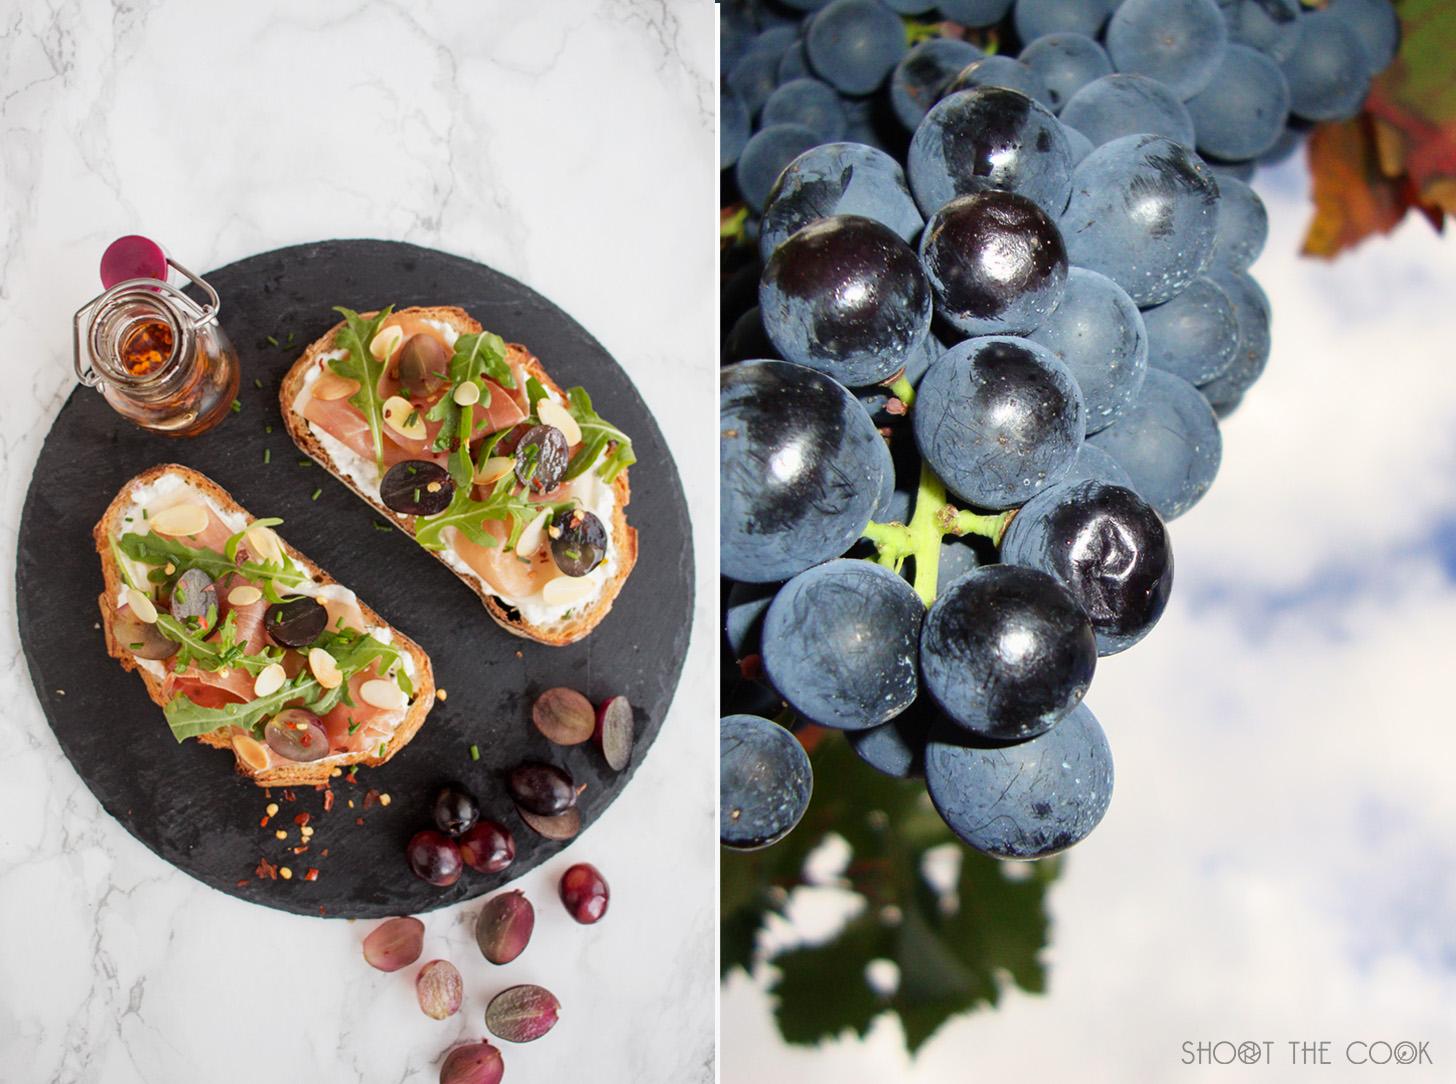 Tosta de jamón y uvas